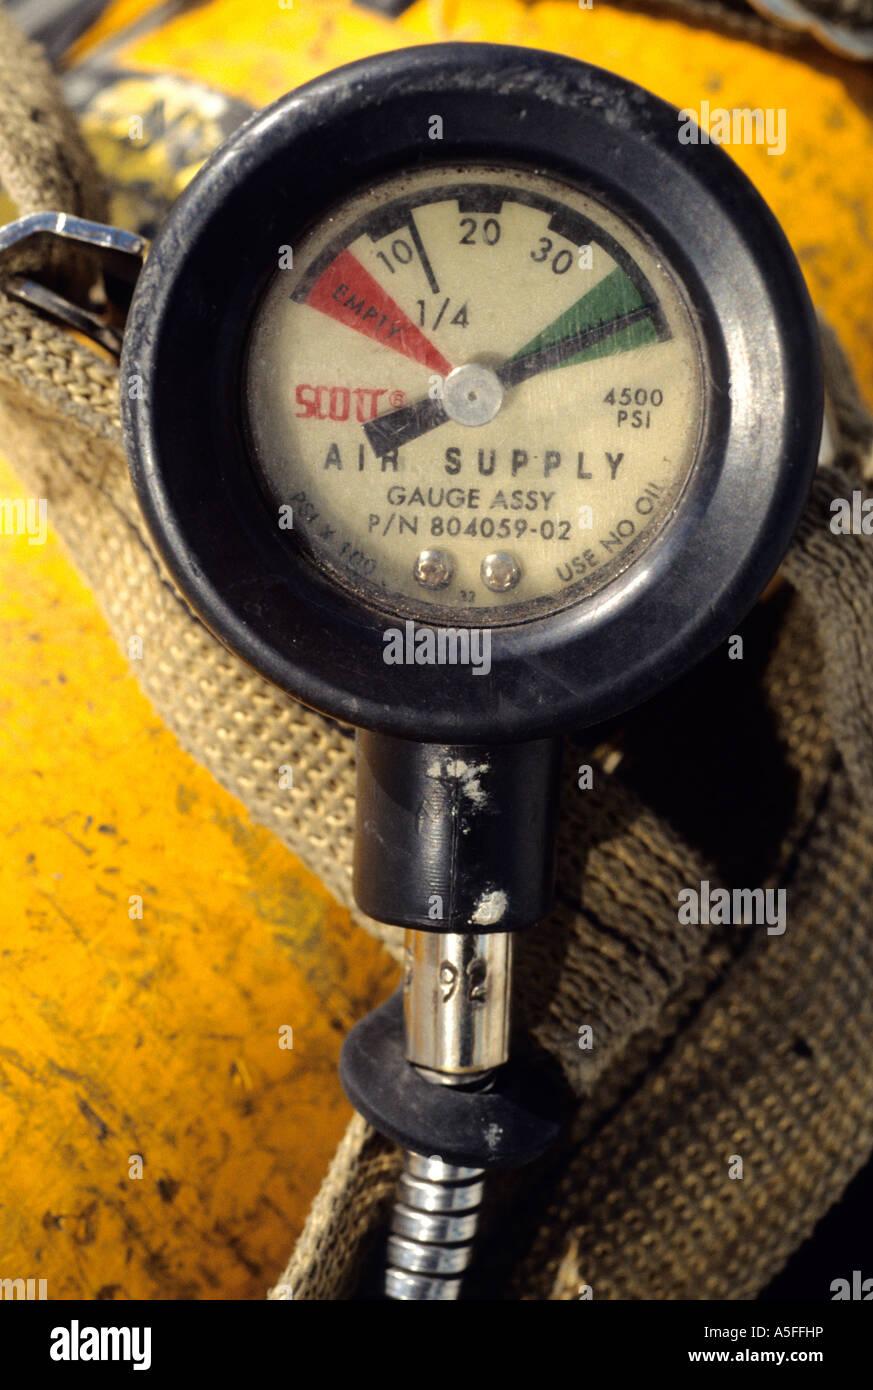 Compressed air tank gauge - Stock Image